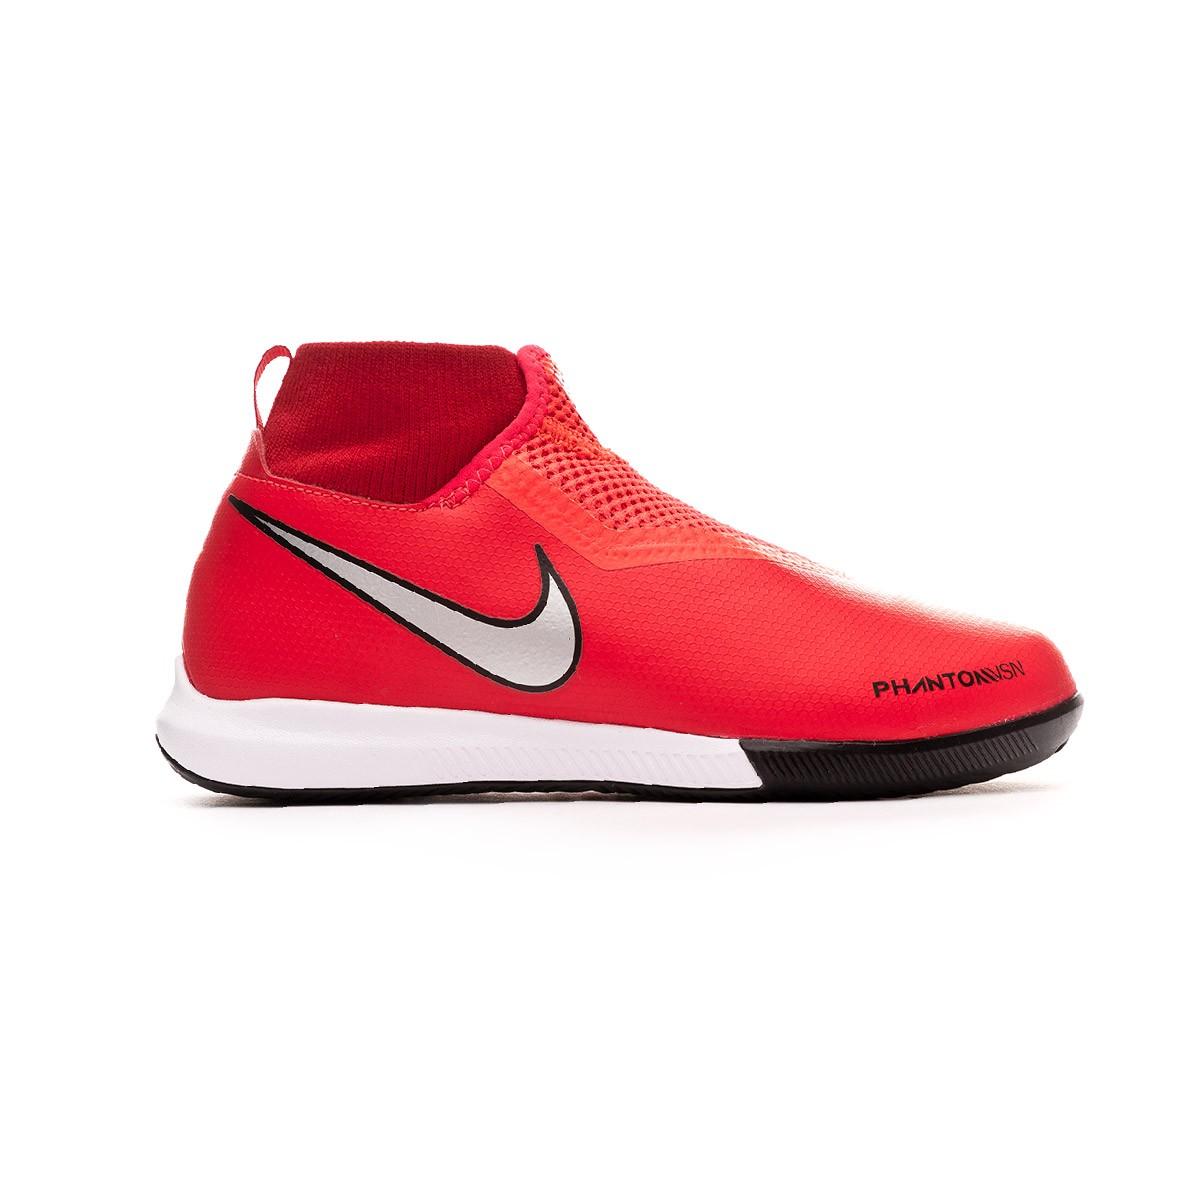 Chaussure Nike DF IC enfant Vision Academy de futsal Phantom vY6f7gyb